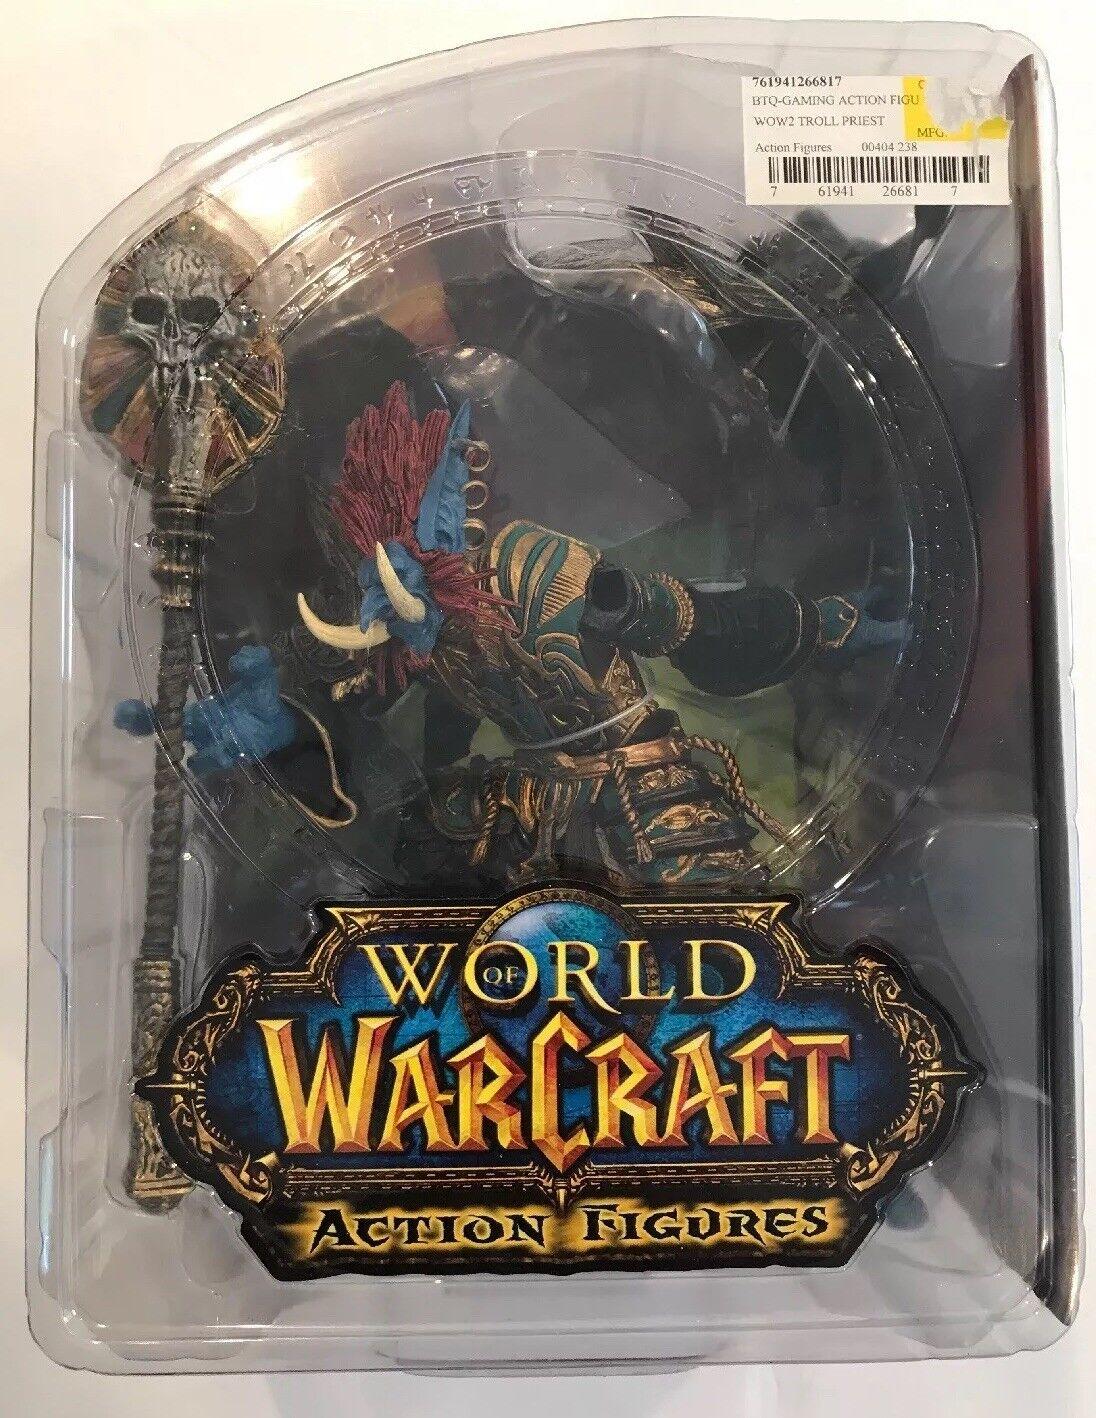 NEW Welt of Warcraft WOW serie 2 Zabra Hexx Troll Priest Wirkung Figure (2008)